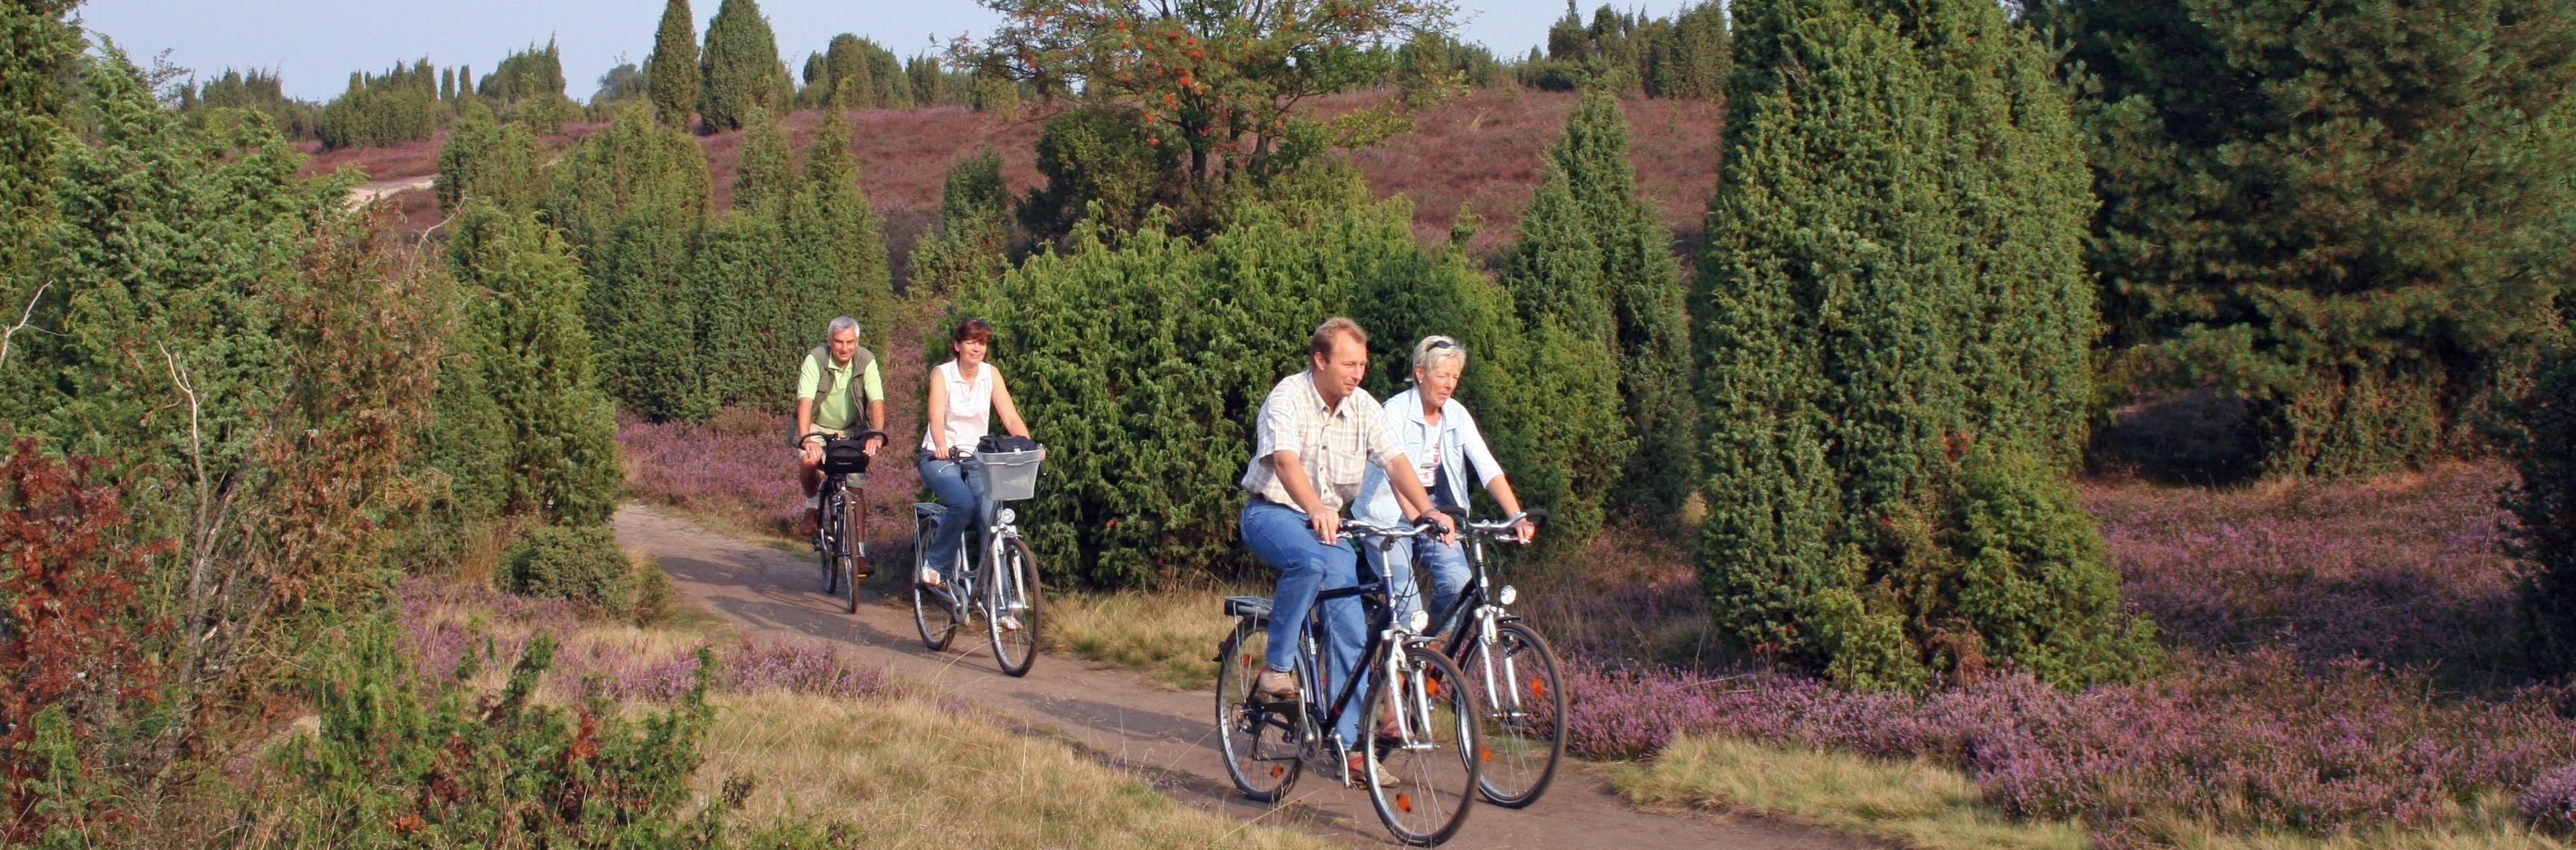 5-daagse fietsvakantie Lüneburger Heide